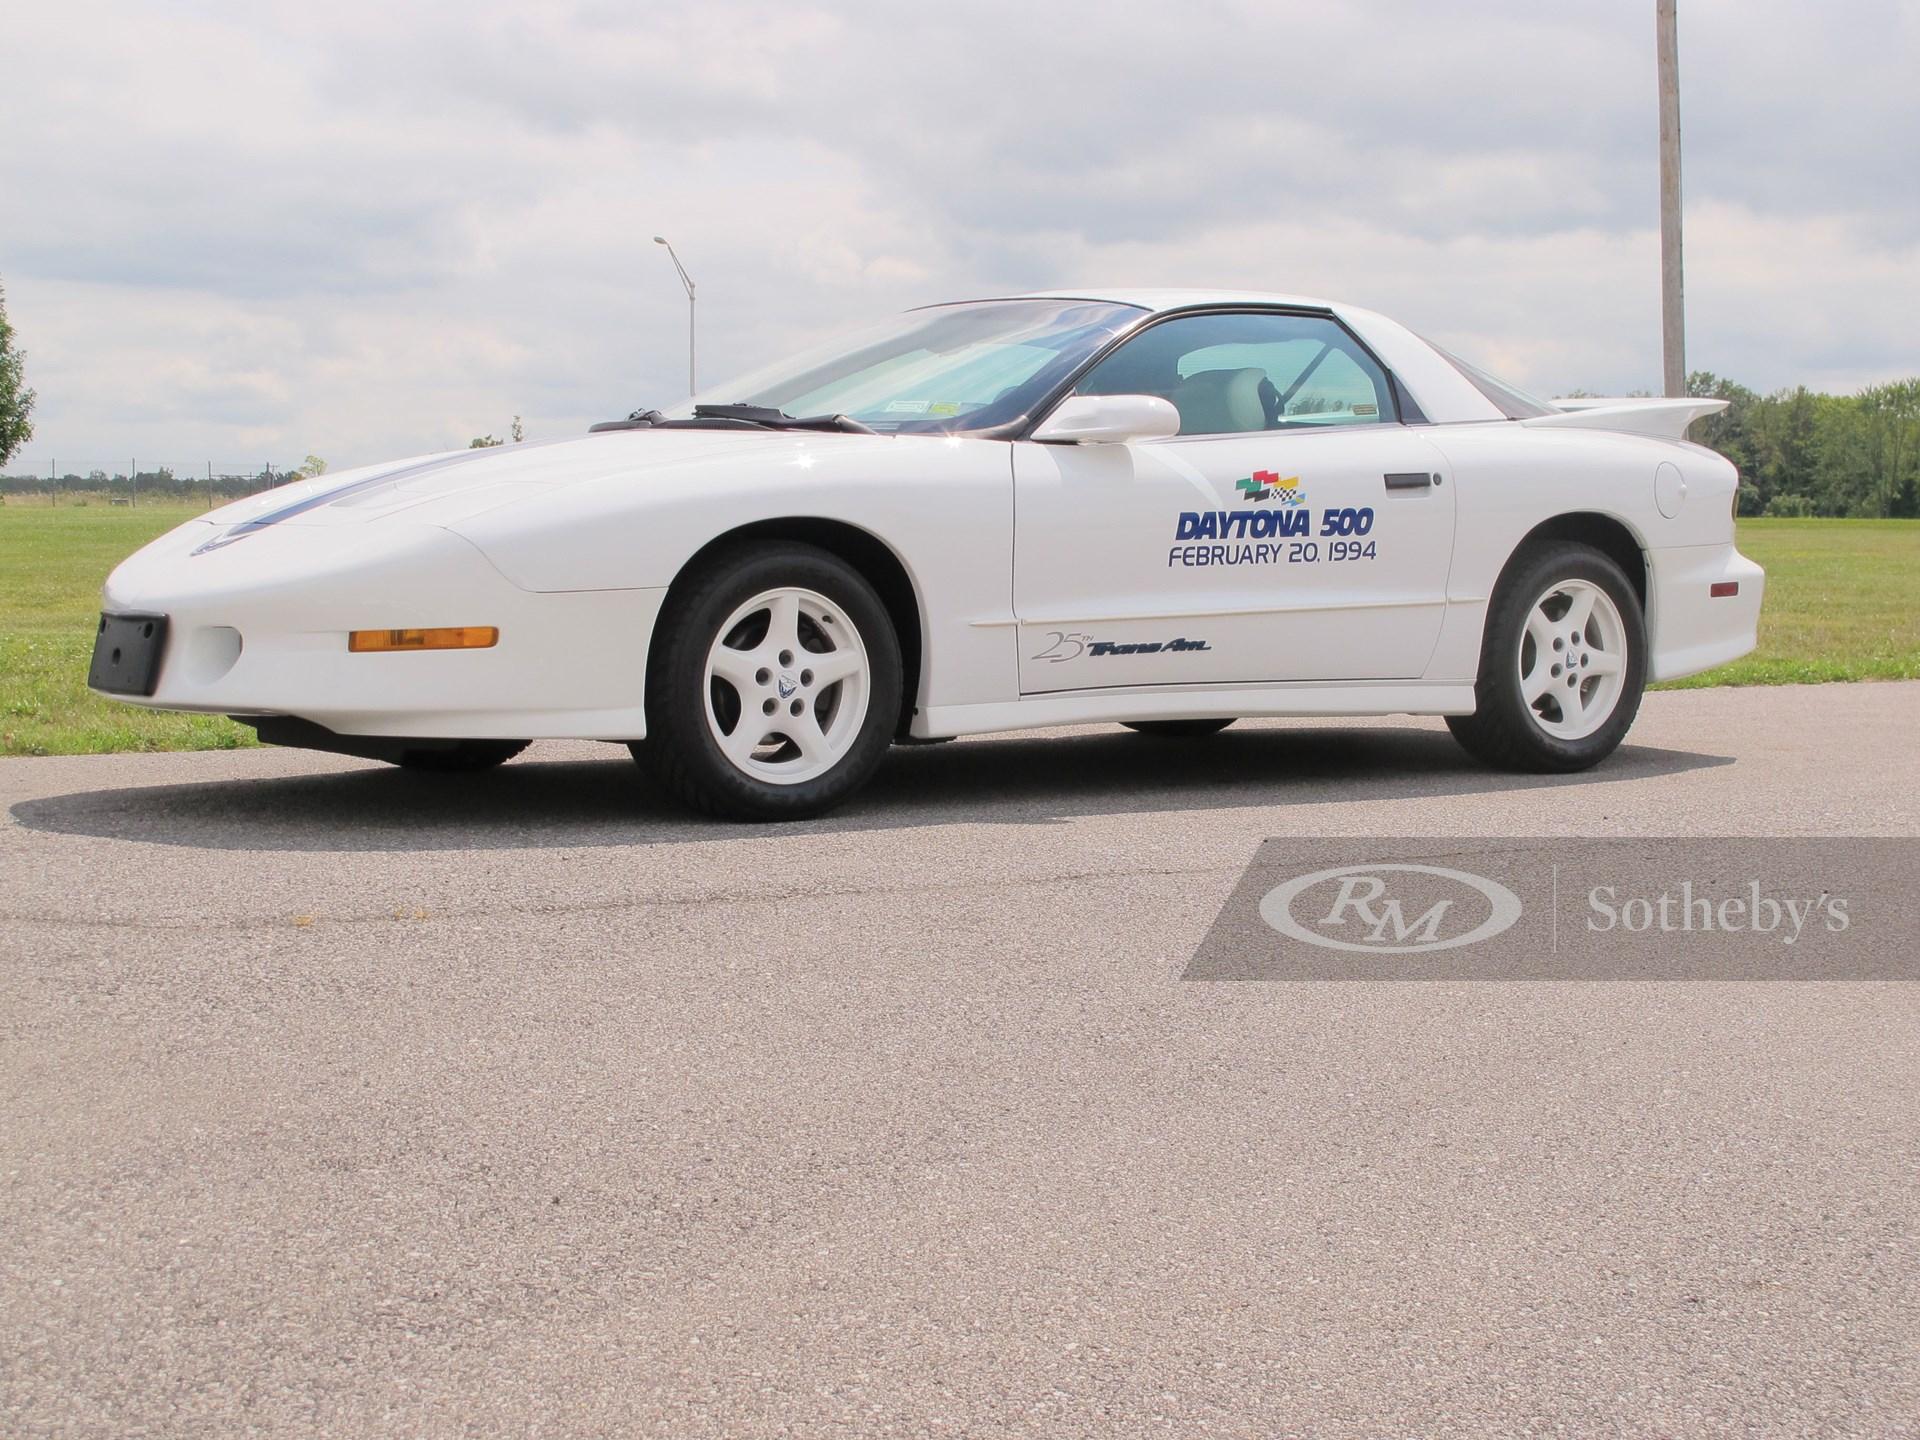 1994 Pontiac Firebird Trans Am 25th Anniversary Edition Daytona 500